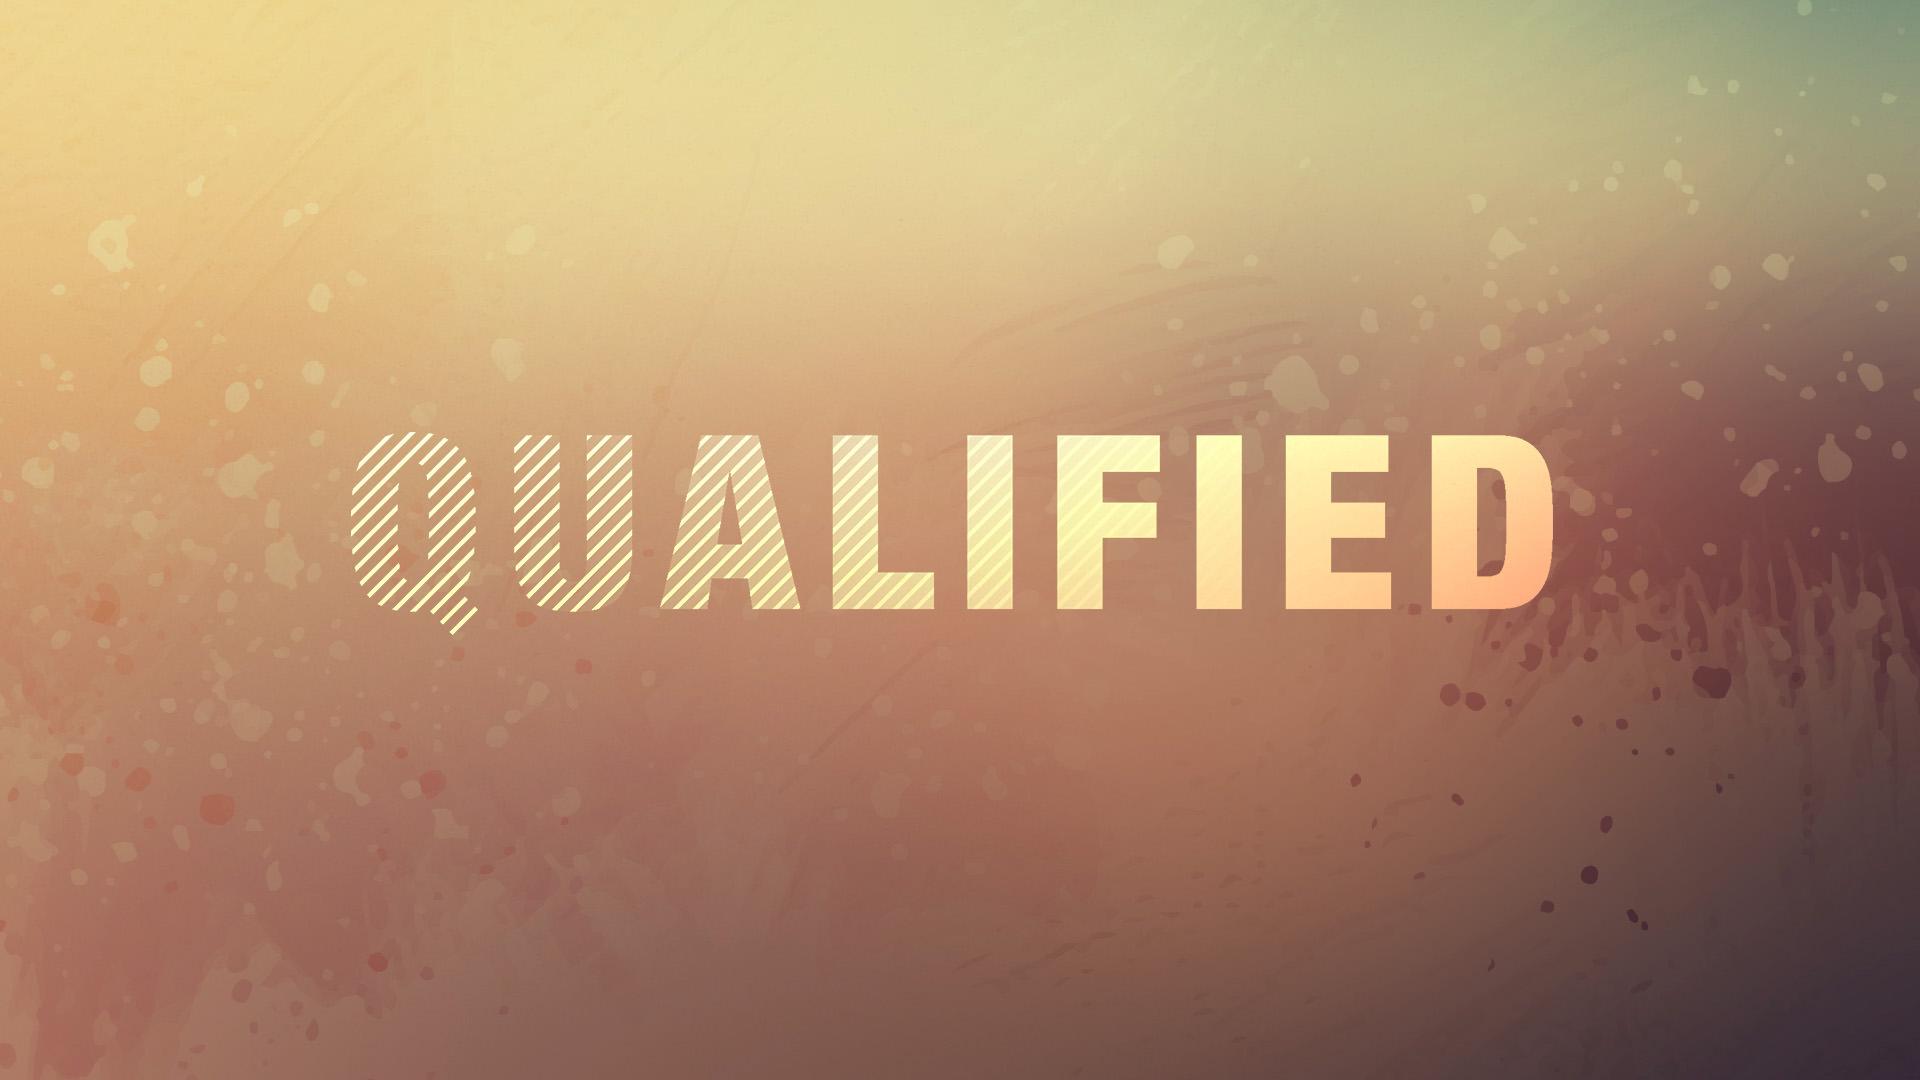 Qualified part 1